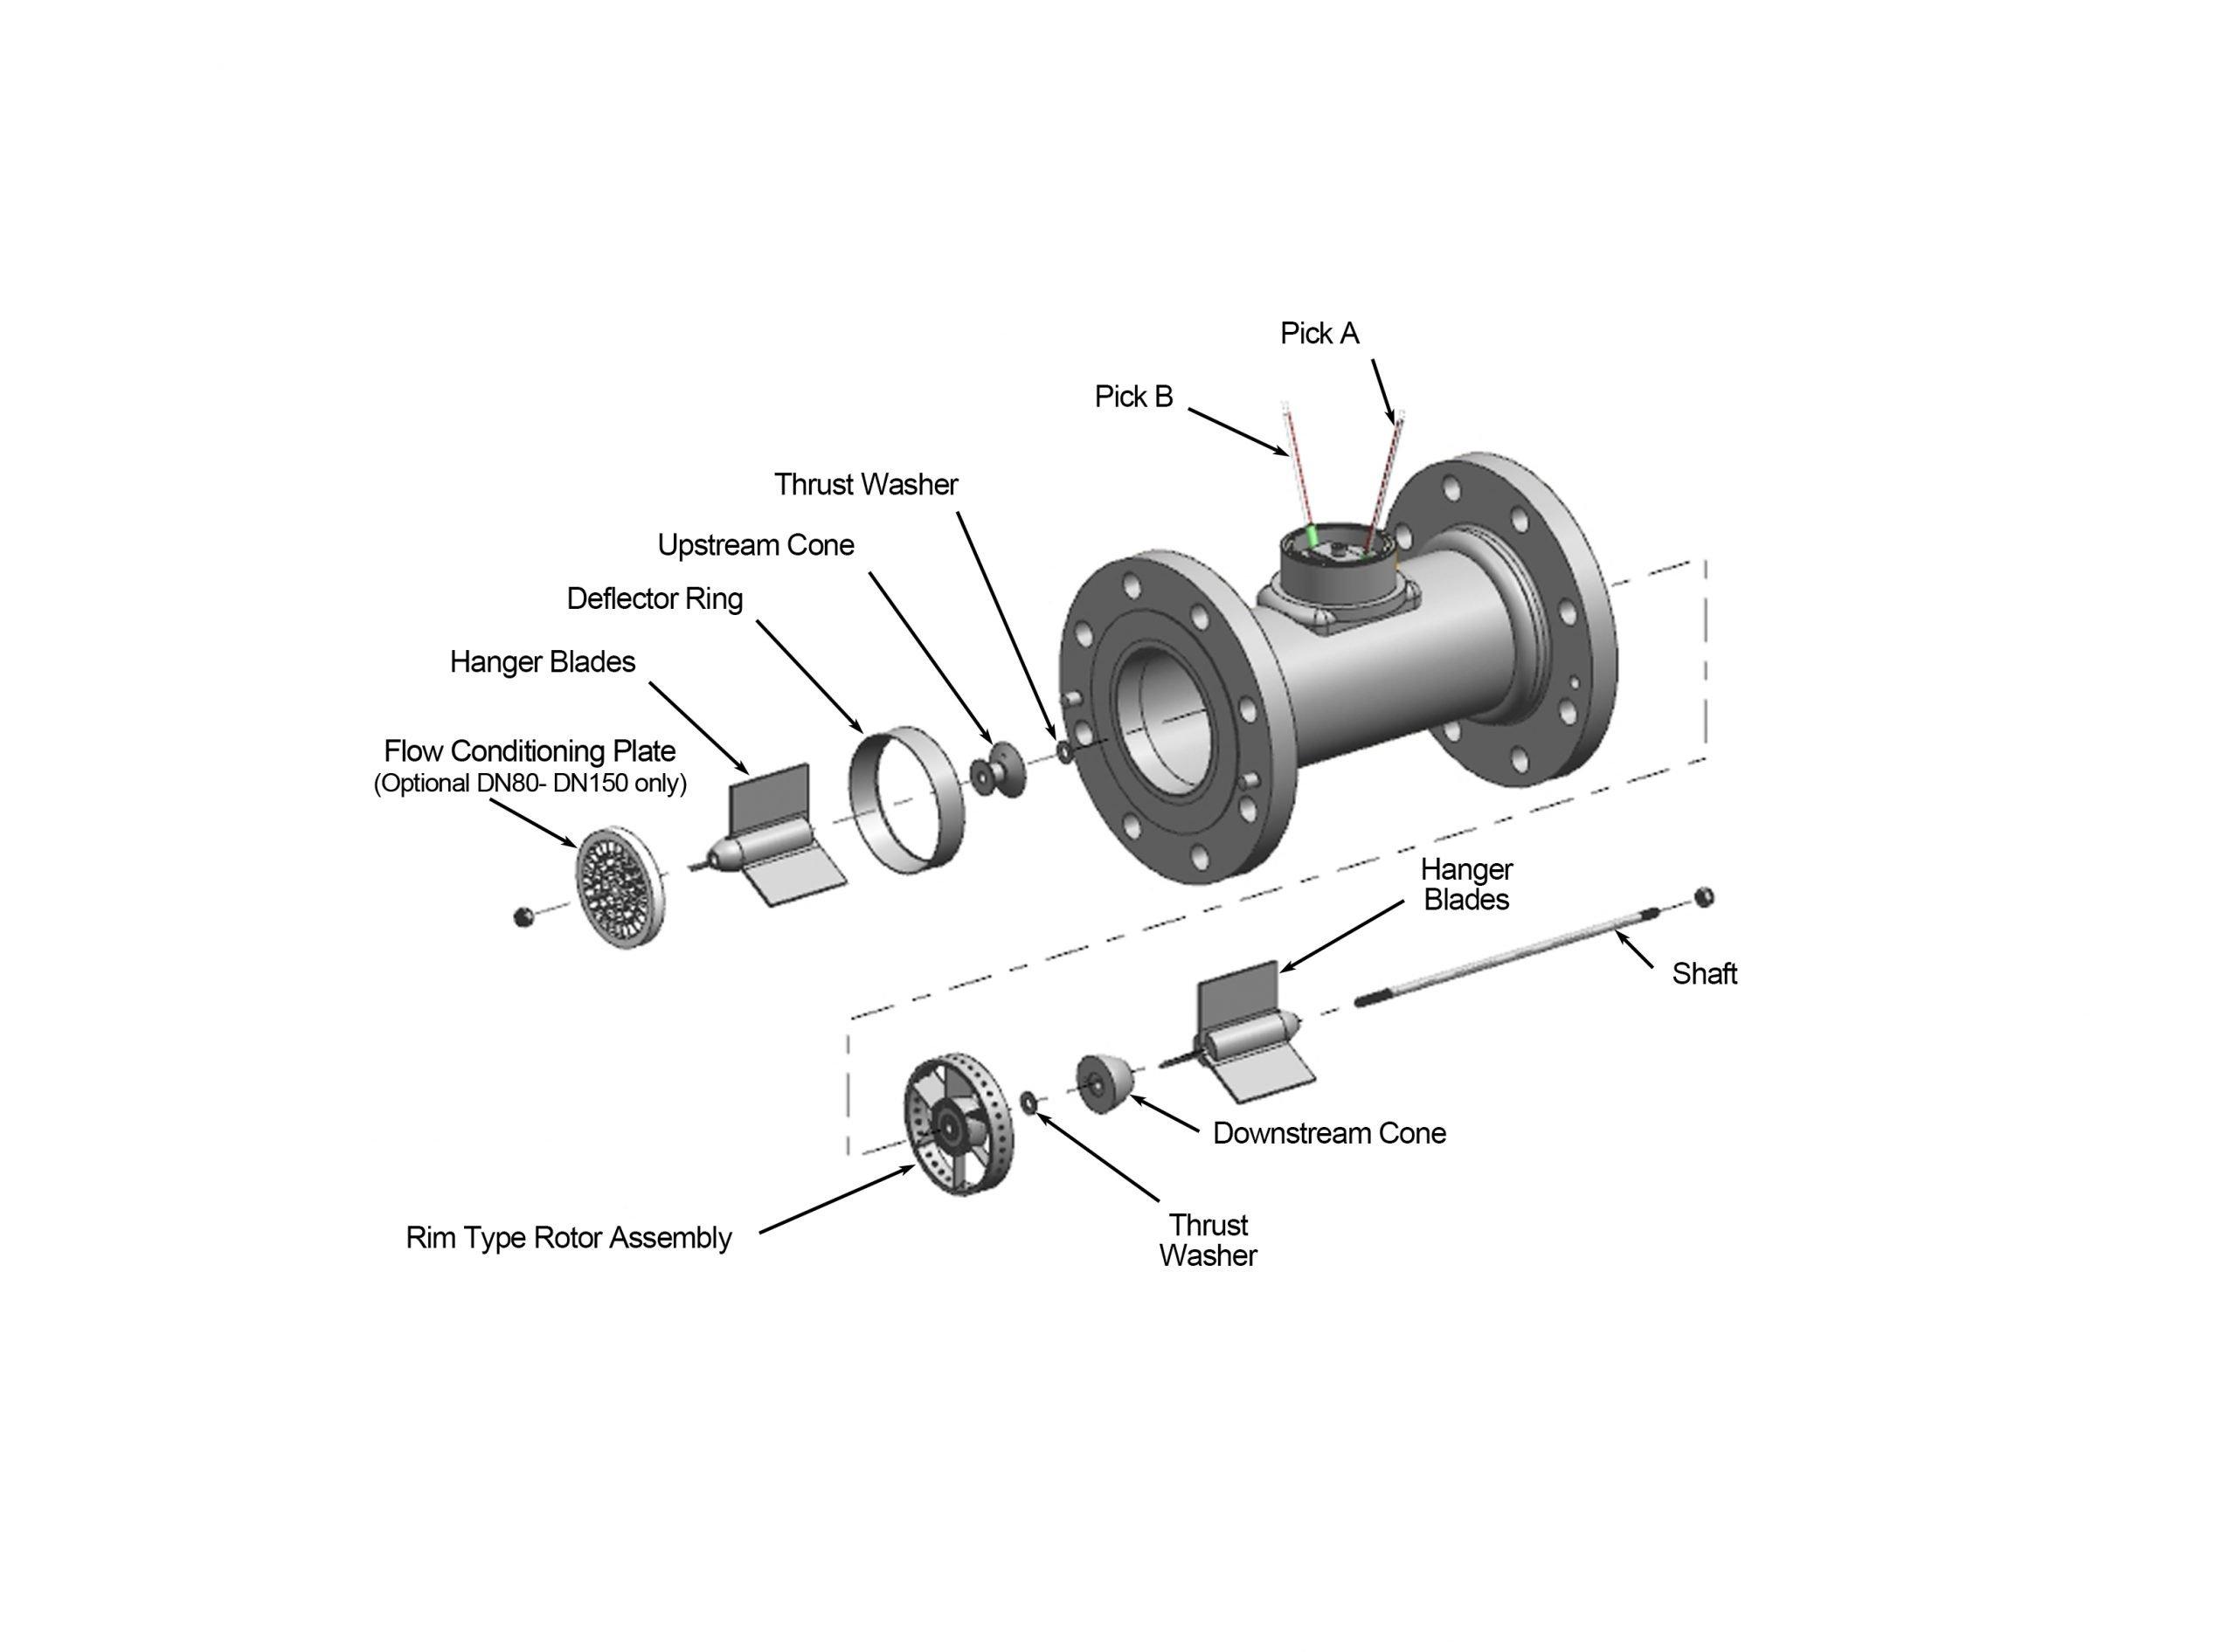 figure 6 theoryof operation turbineflowmeter